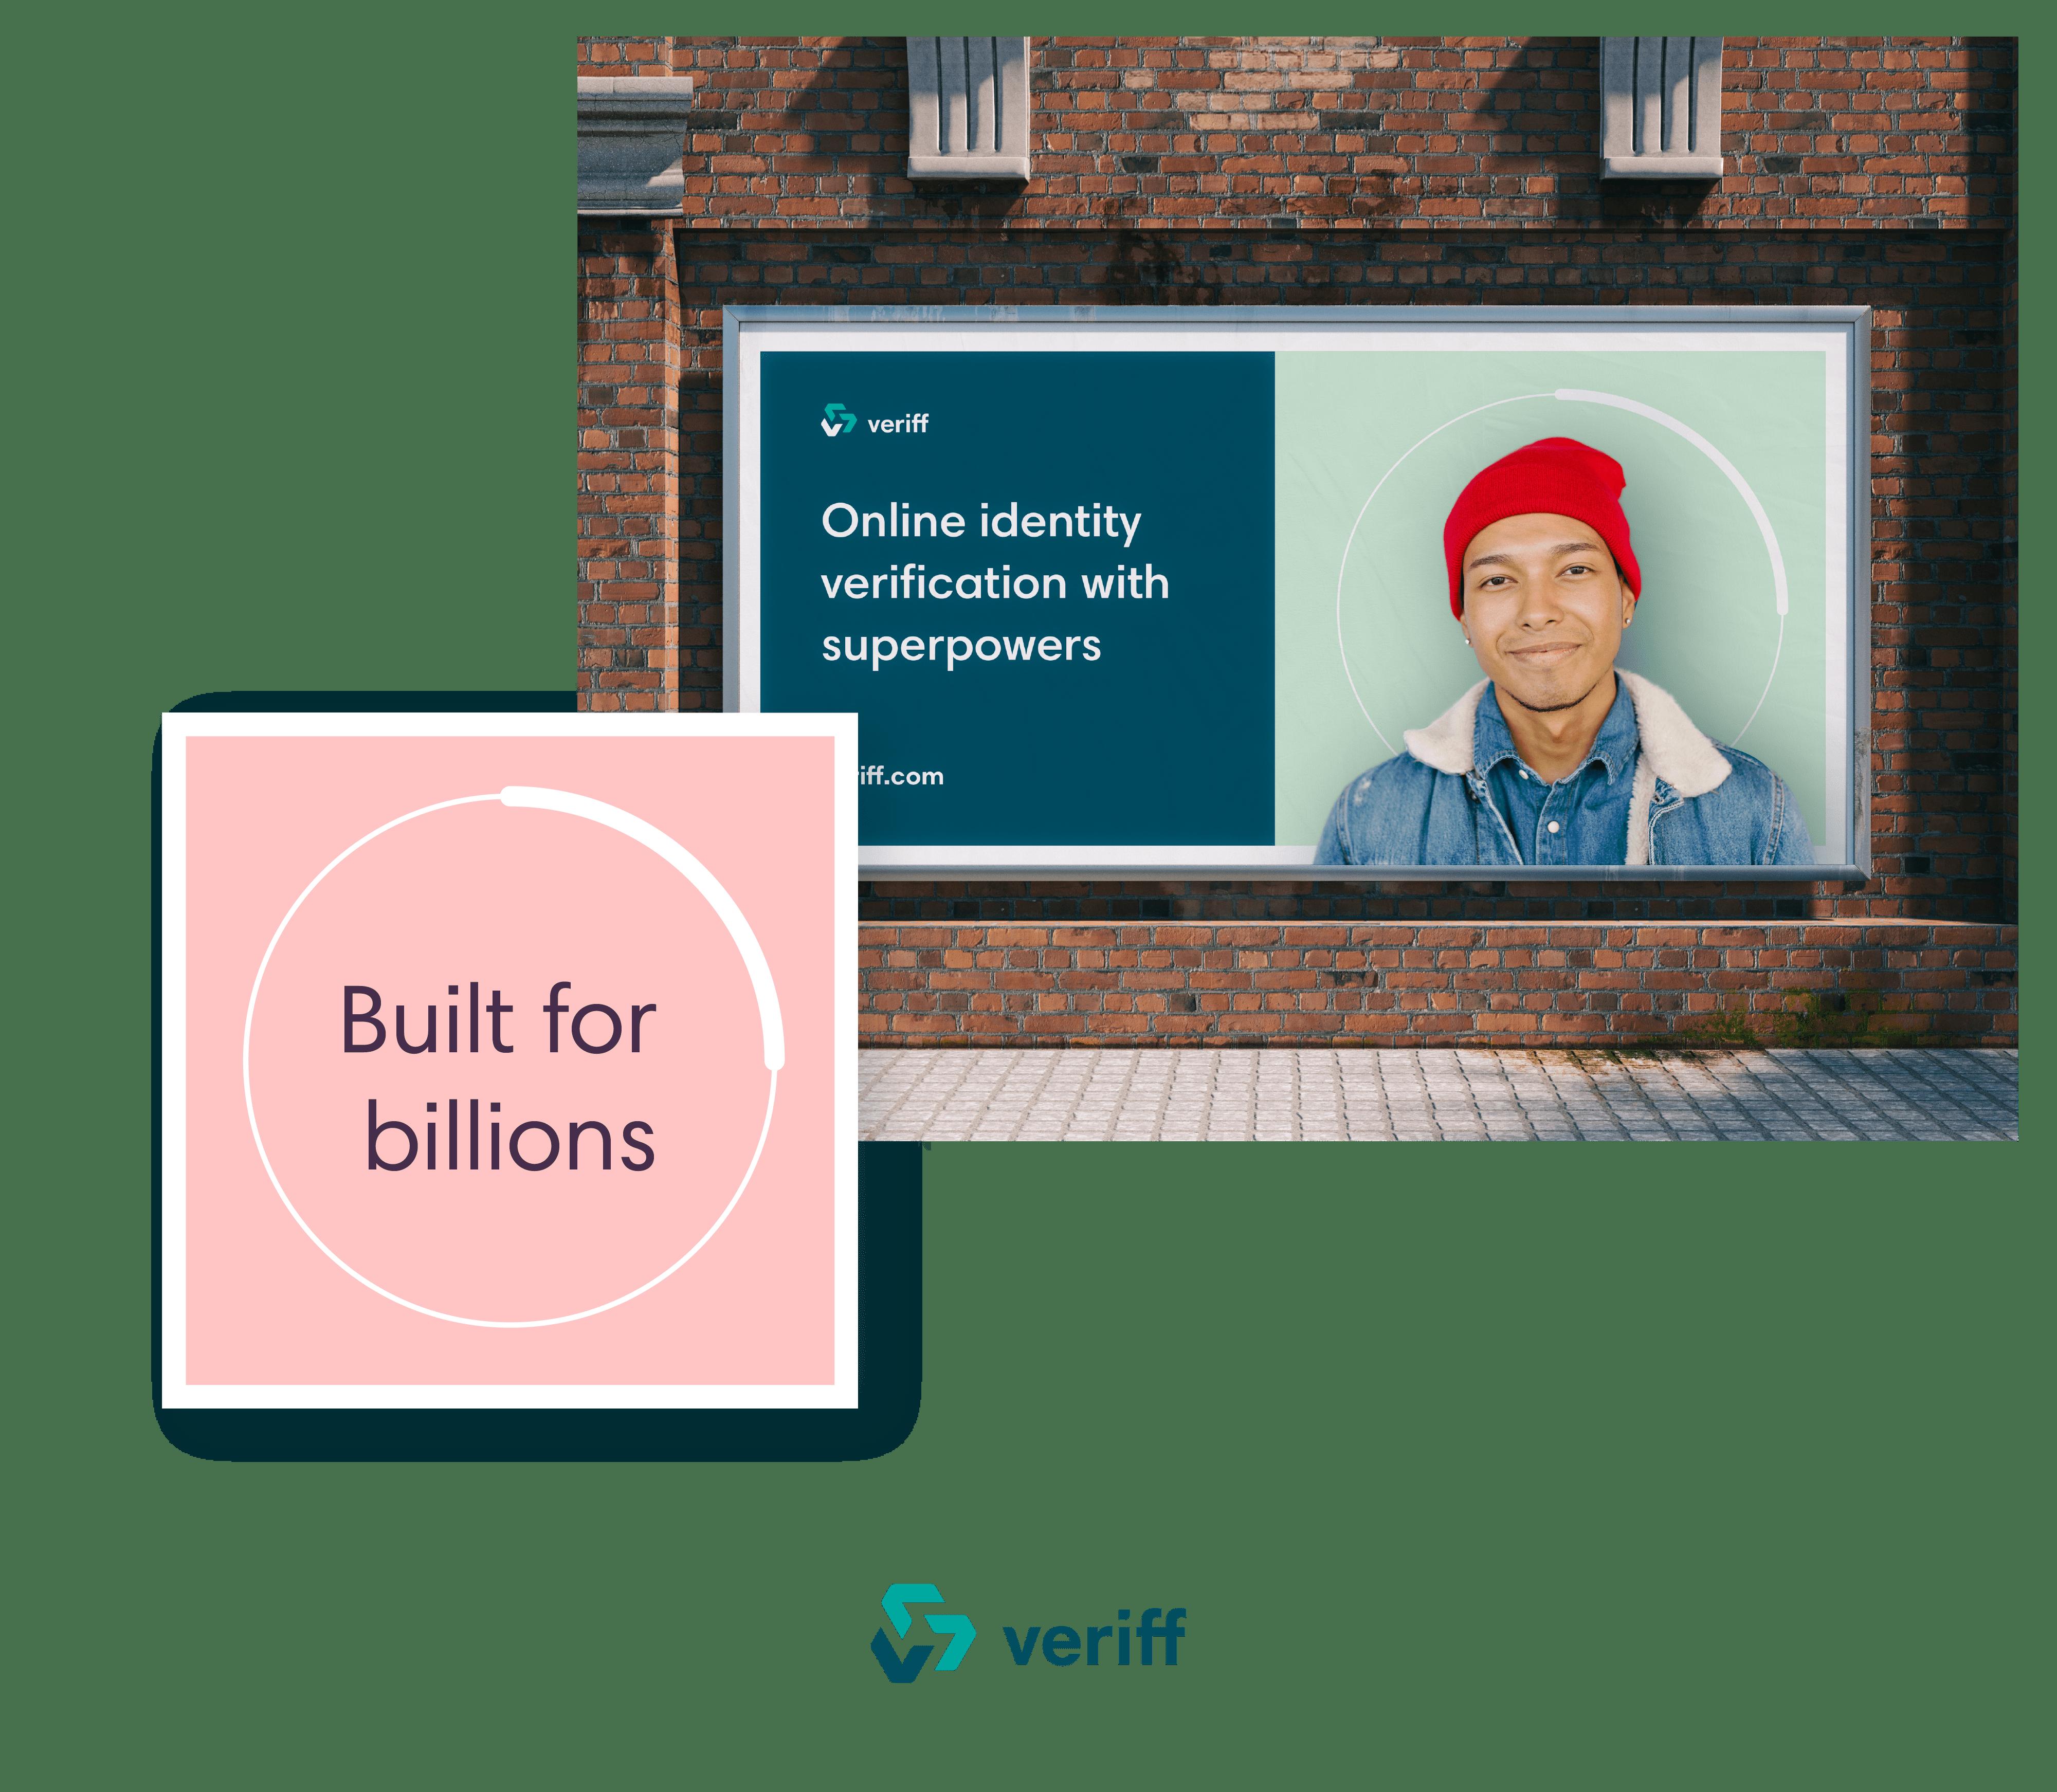 Identity verification that is built for billions